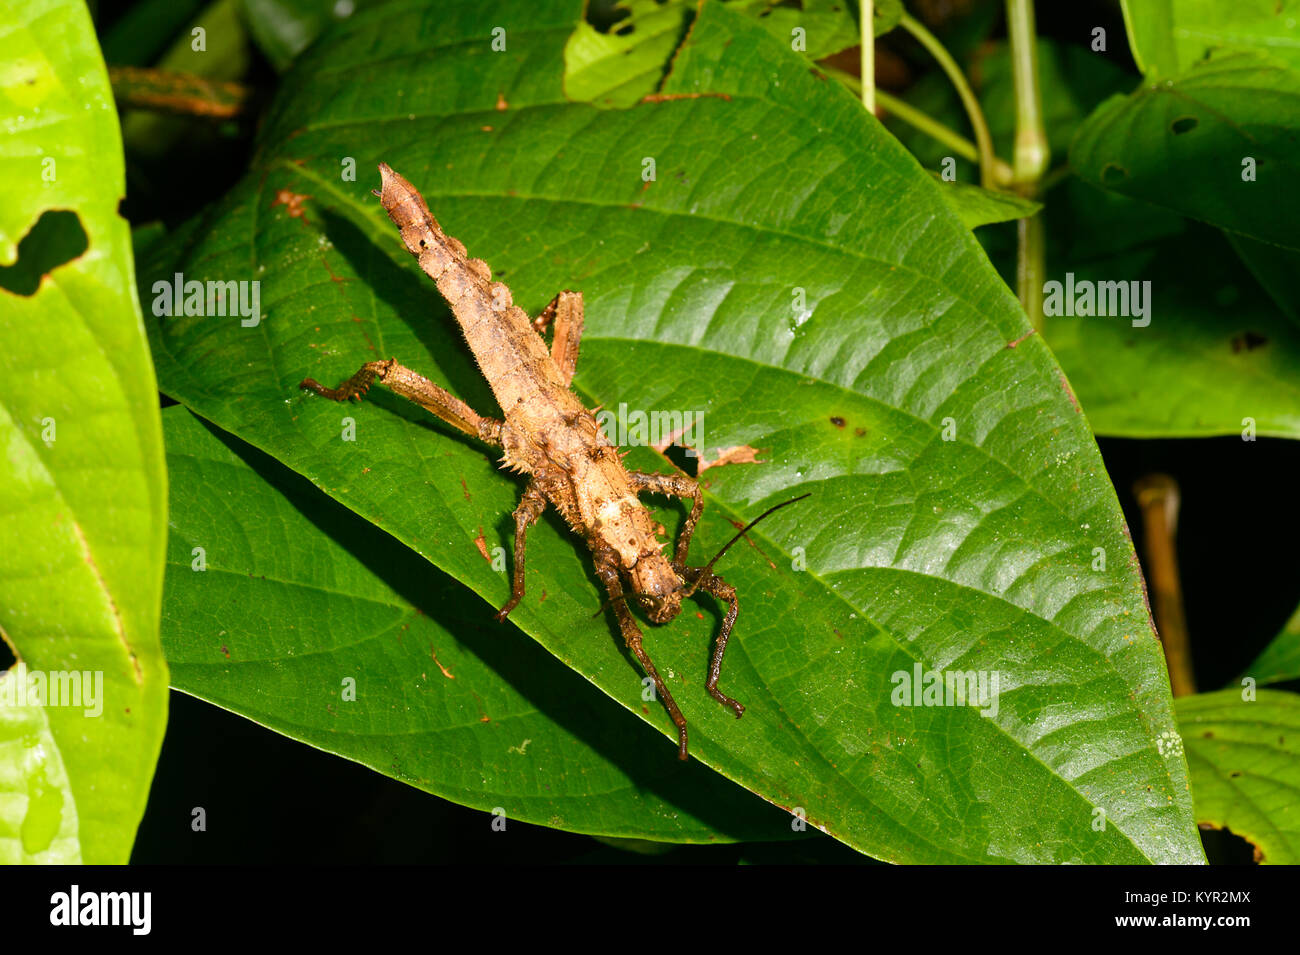 Close-up d'un Phasme épineux (Aretaon asperrimus), Tabin, Bornéo, Sabah, Malaisie Photo Stock